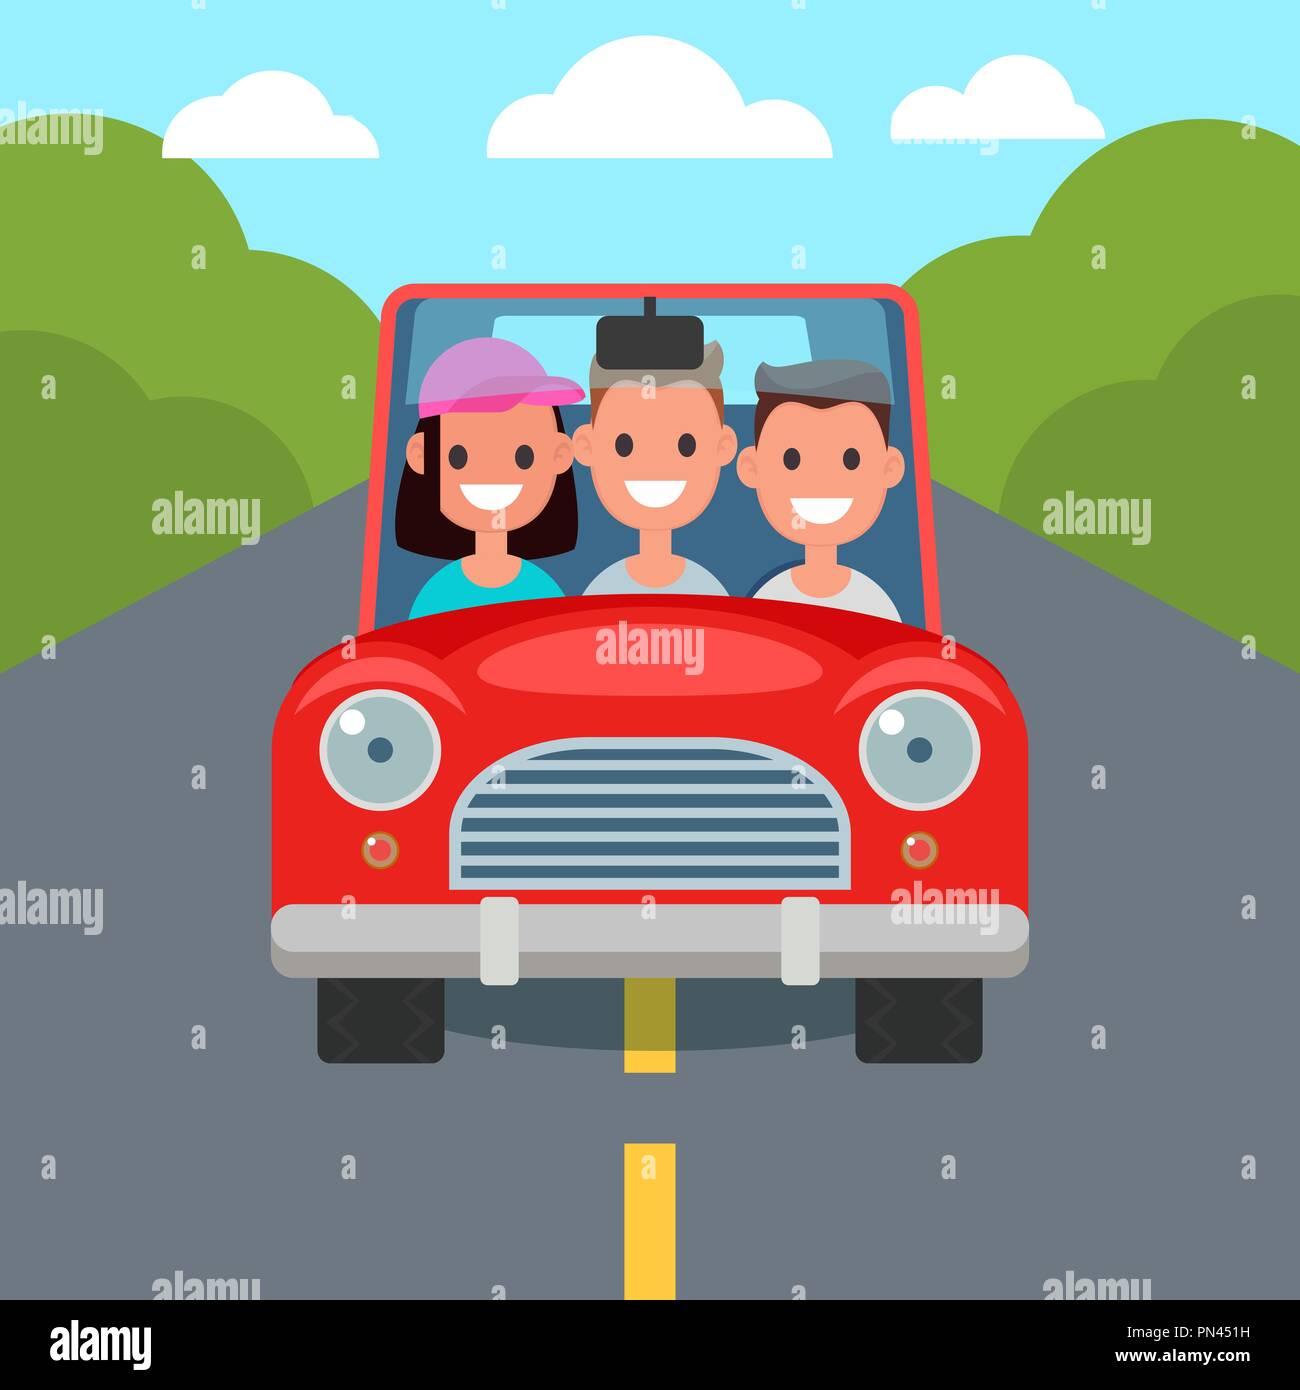 Flat Design Car Driving Characters Car Sharing Vector Stock Vector